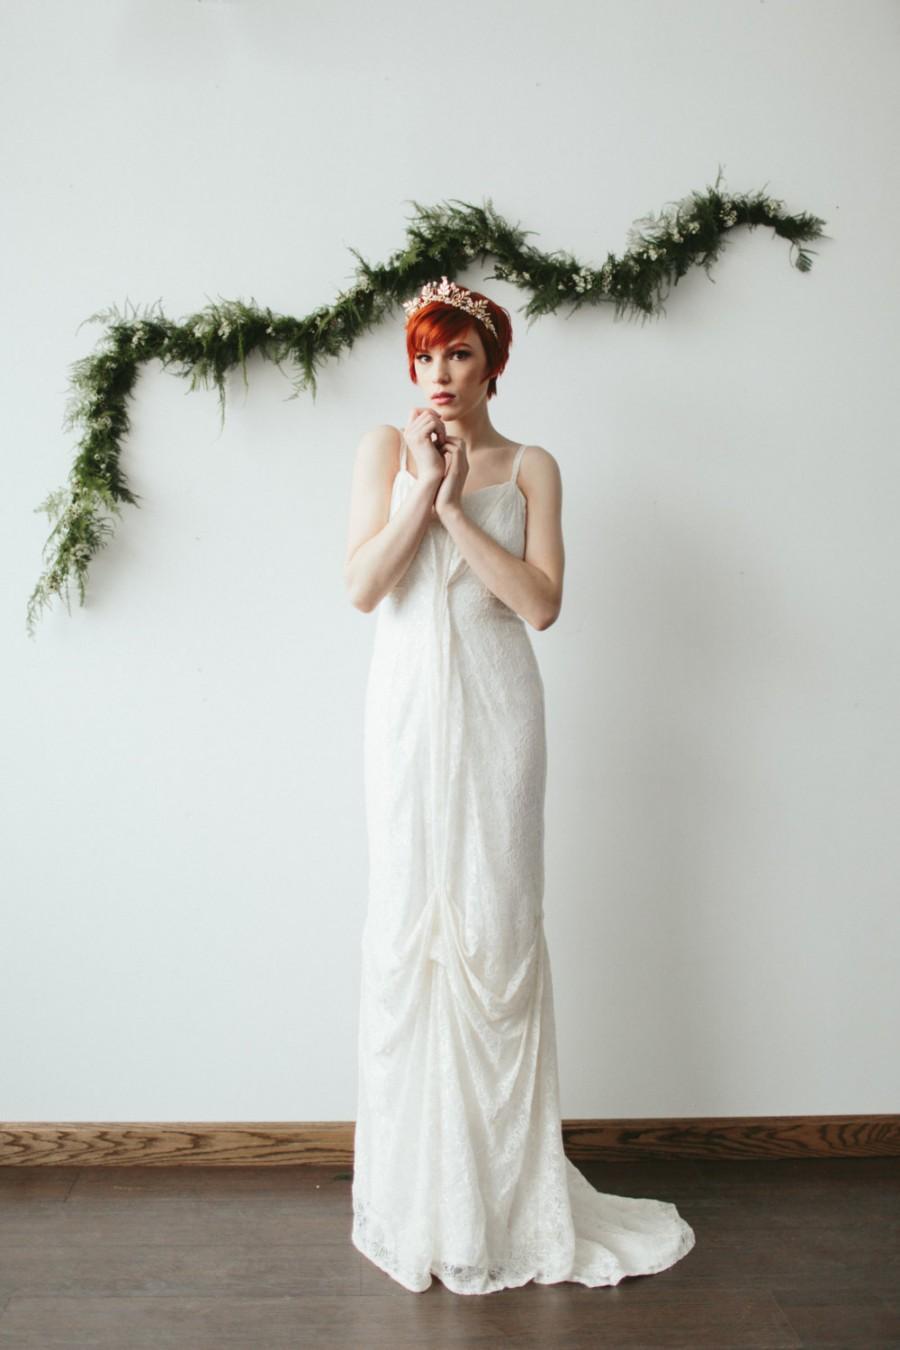 nightmare before christmas wedding dresses christmas wedding dresses Nightmare Before Christmas Wedding Dresses 21